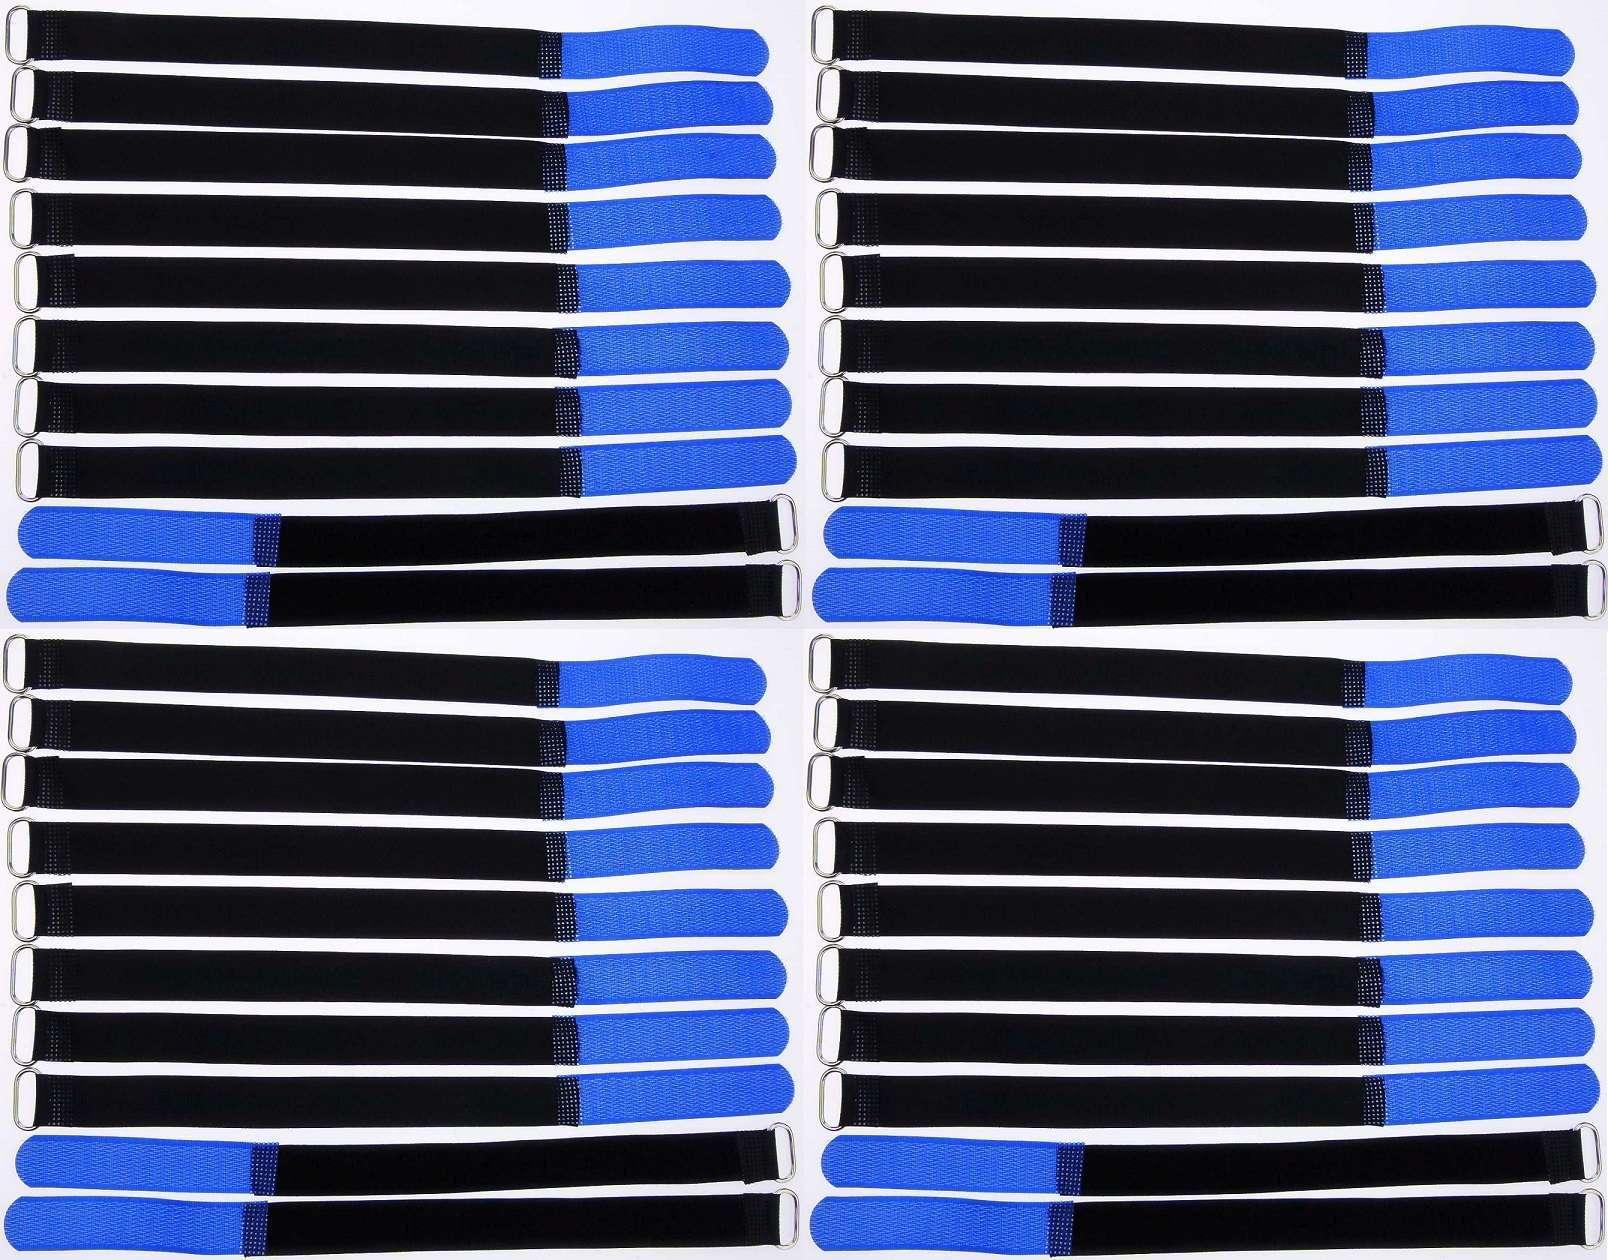 40x Klettbänder Kabelklett 300 x 20mm rot Kabel Klett Band Kabelbinder Klettband